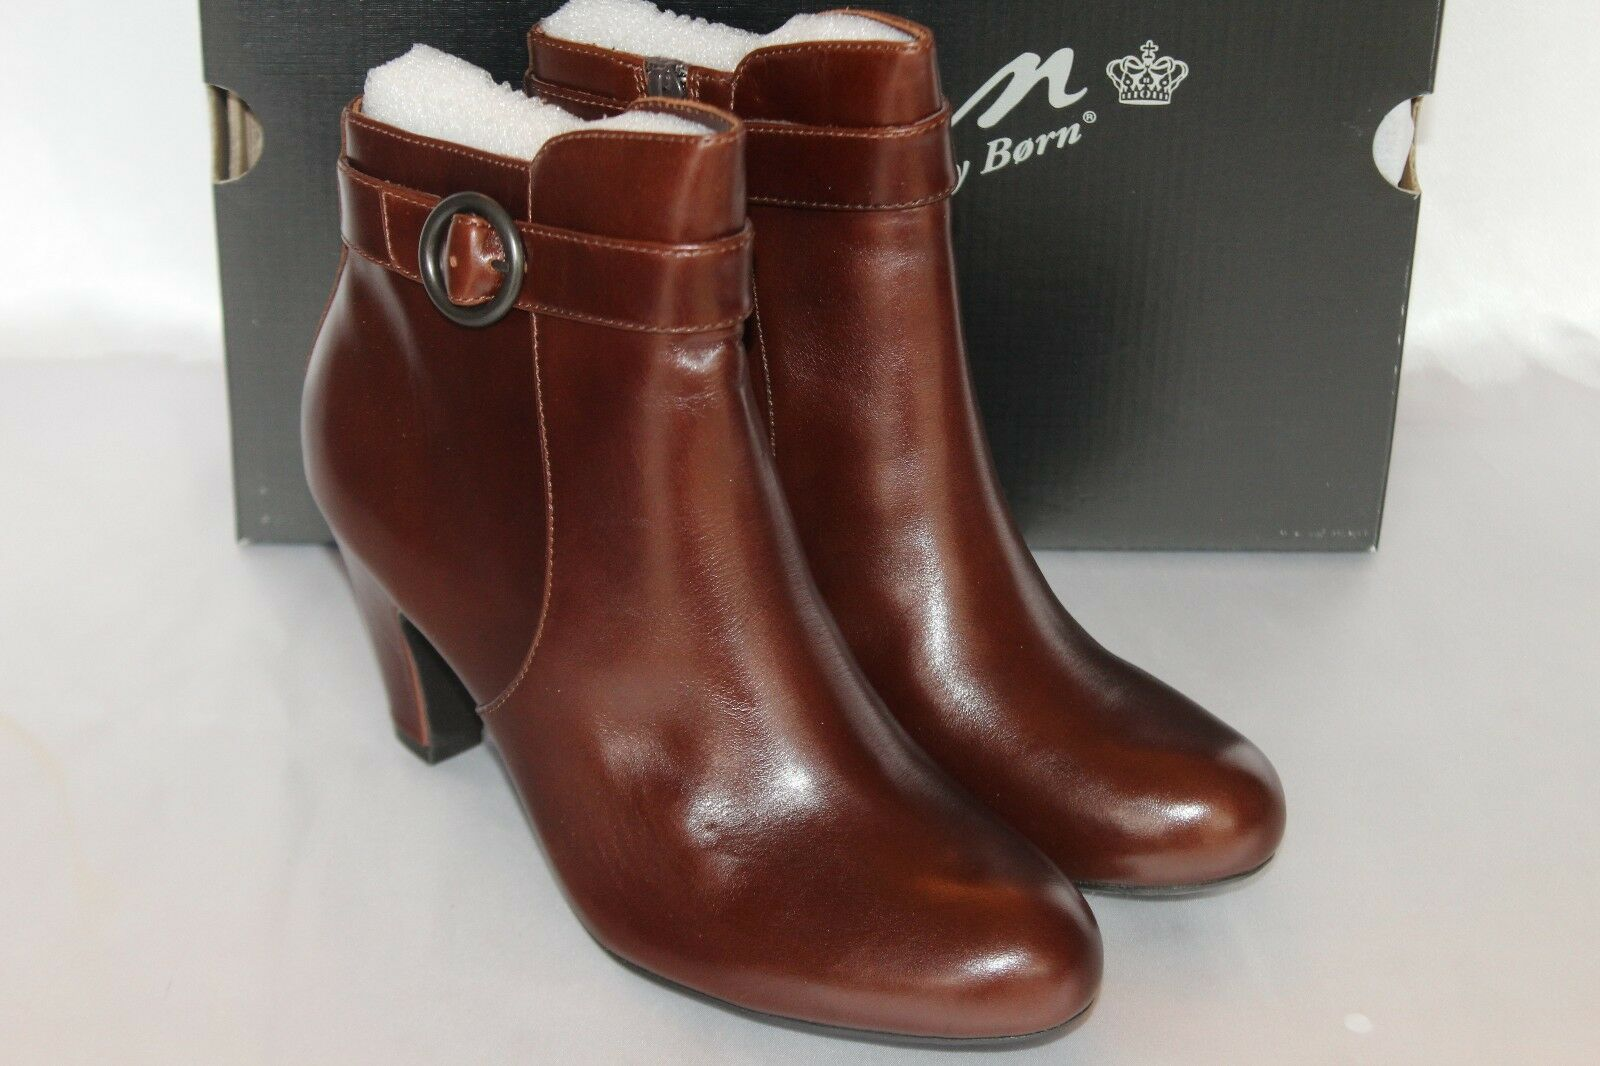 NEW! NIB! BORN Tan Brown Leather LUNNA Zip Ankle Boots Sz 8 10